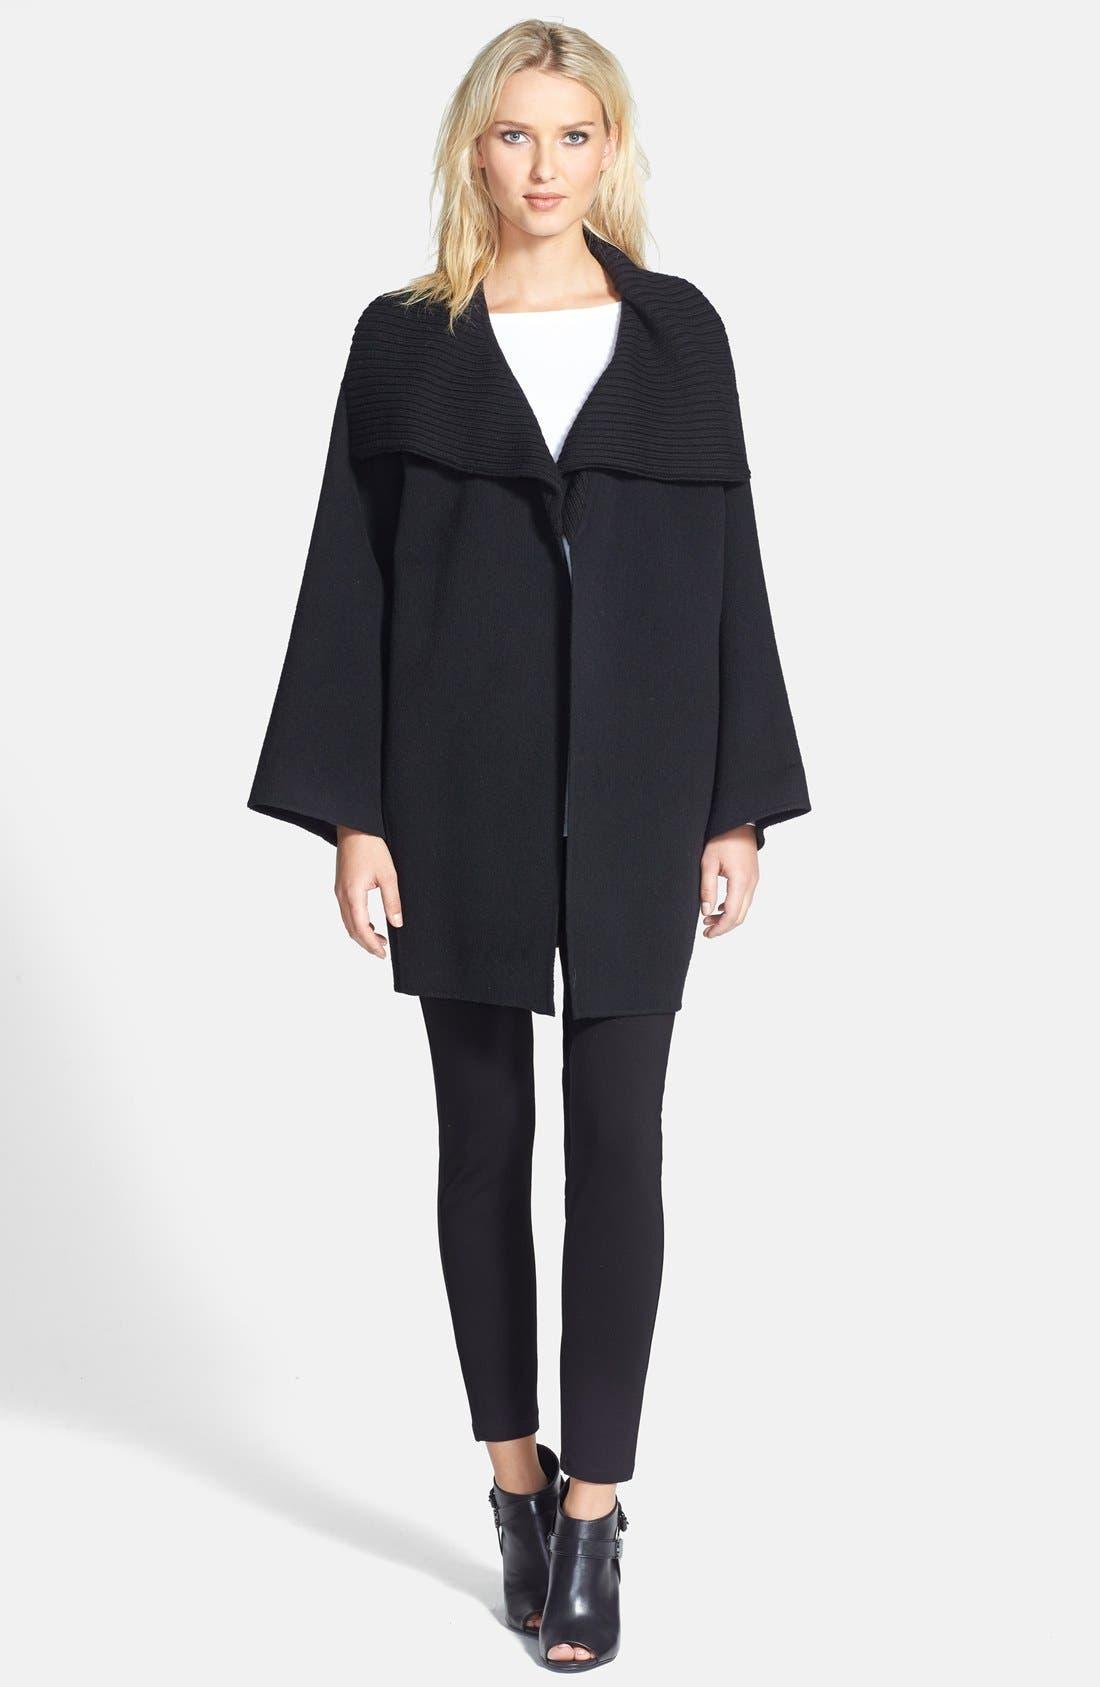 Alternate Image 3  - Eileen Fisher Knit Funnel Collar Wool Blend Coat (Petite) (Online Only)